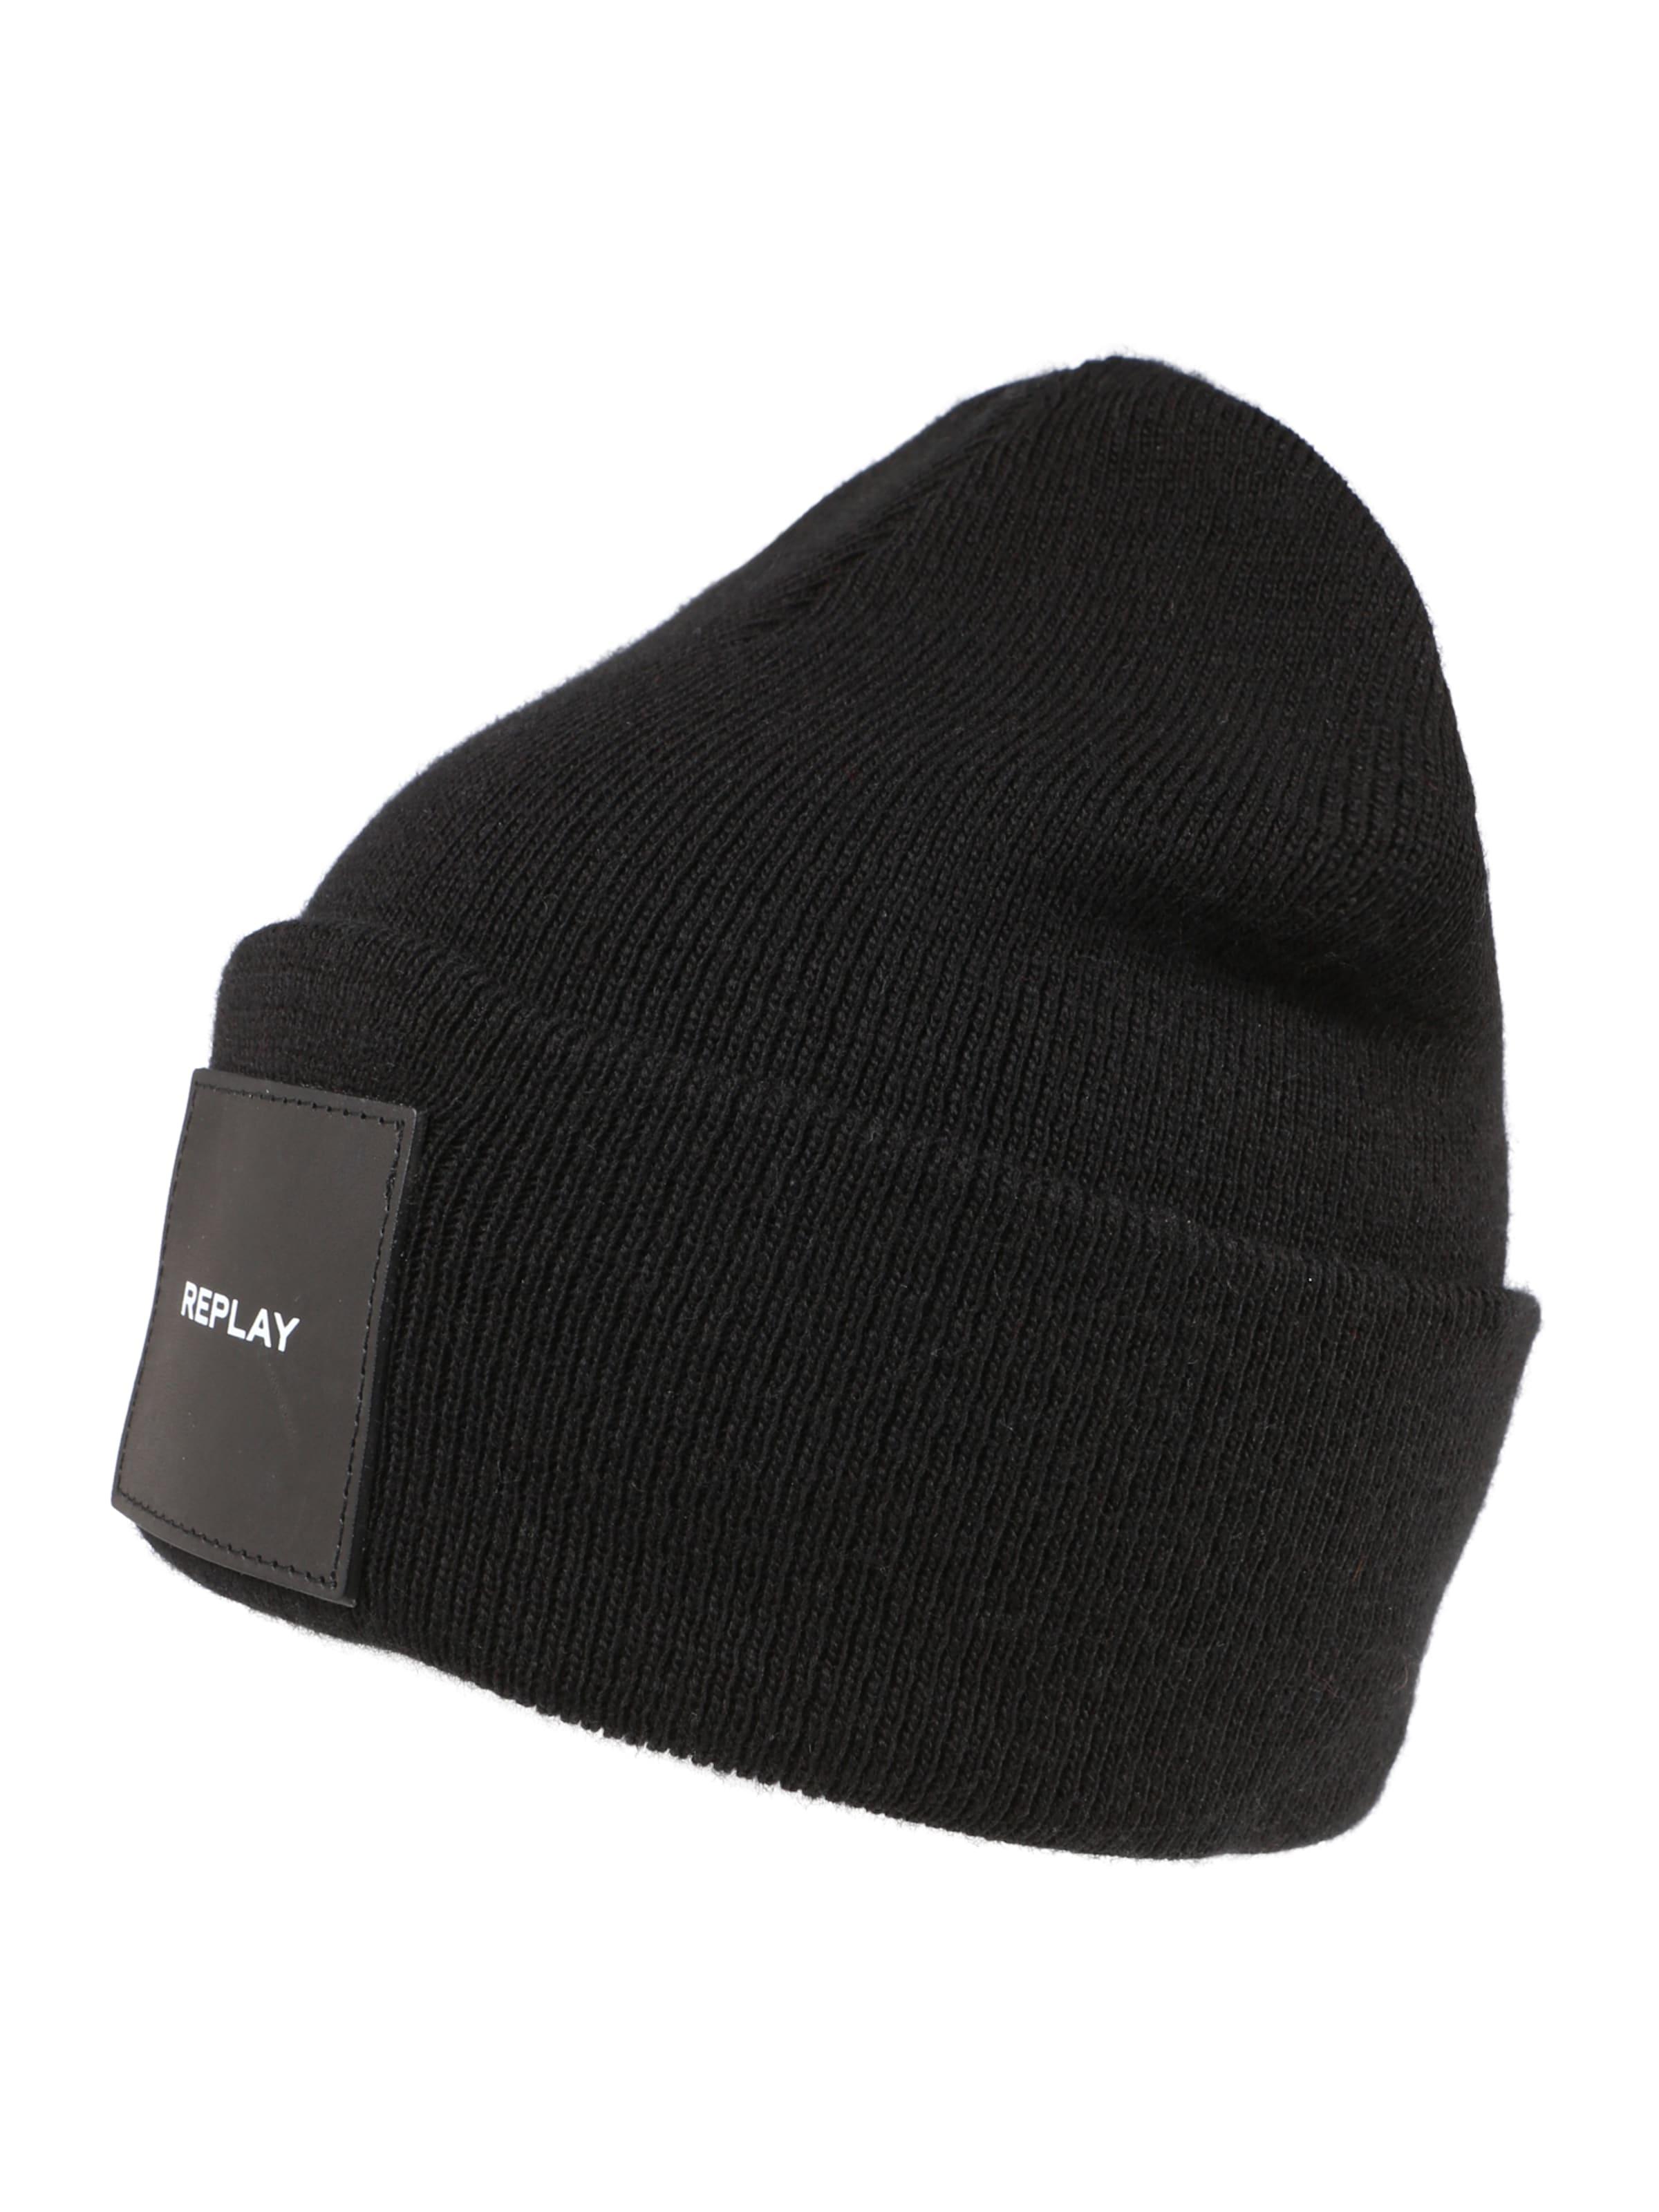 Bonnet En Noir Replay Noir Bonnet Replay Replay En En Bonnet Ygfy7b6